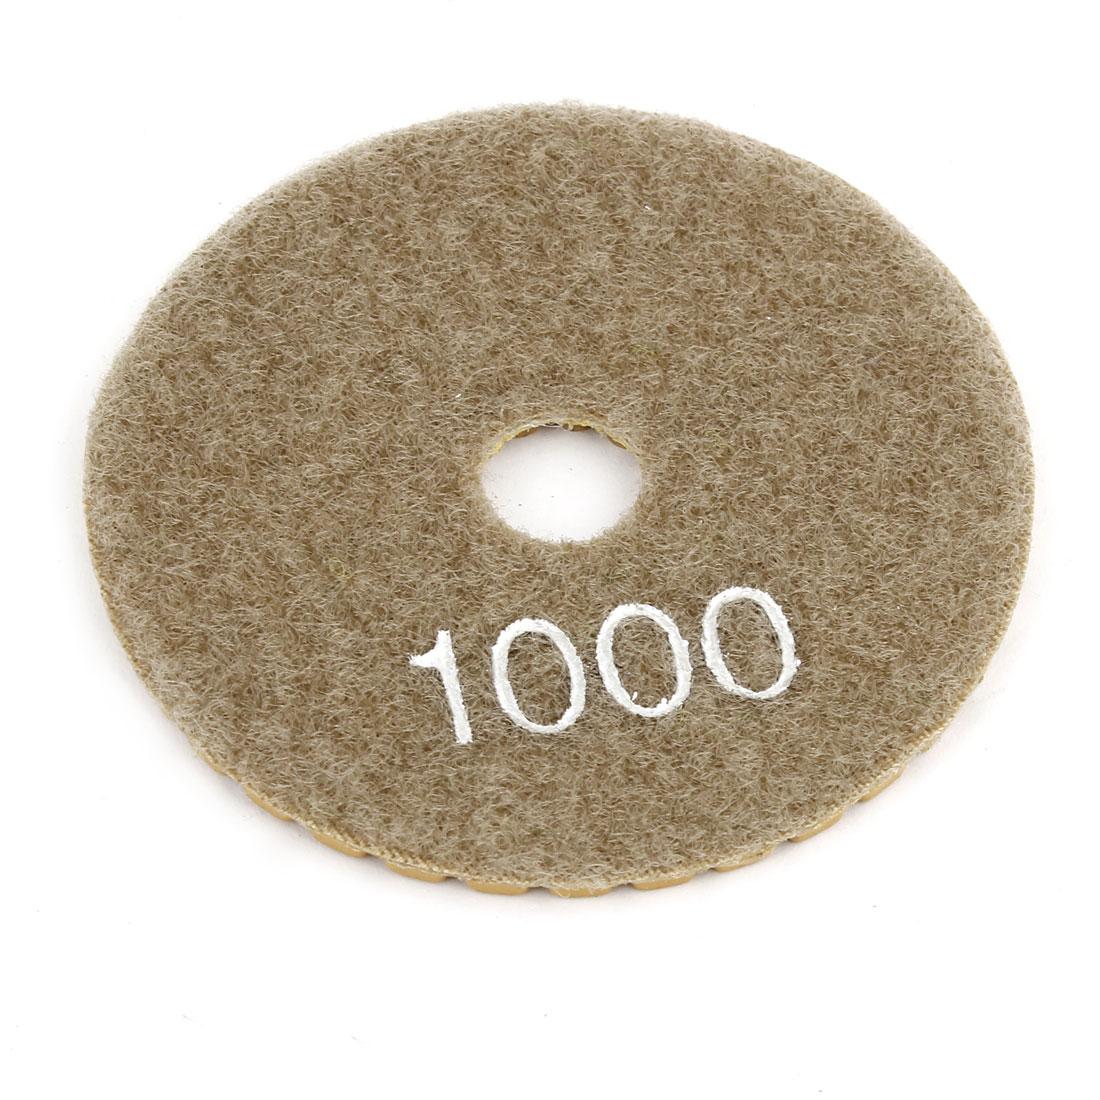 "Brown Gray Grit 100 3"" Diameter Tile Stone Polisher Grinder Diamond Polishing Pad"